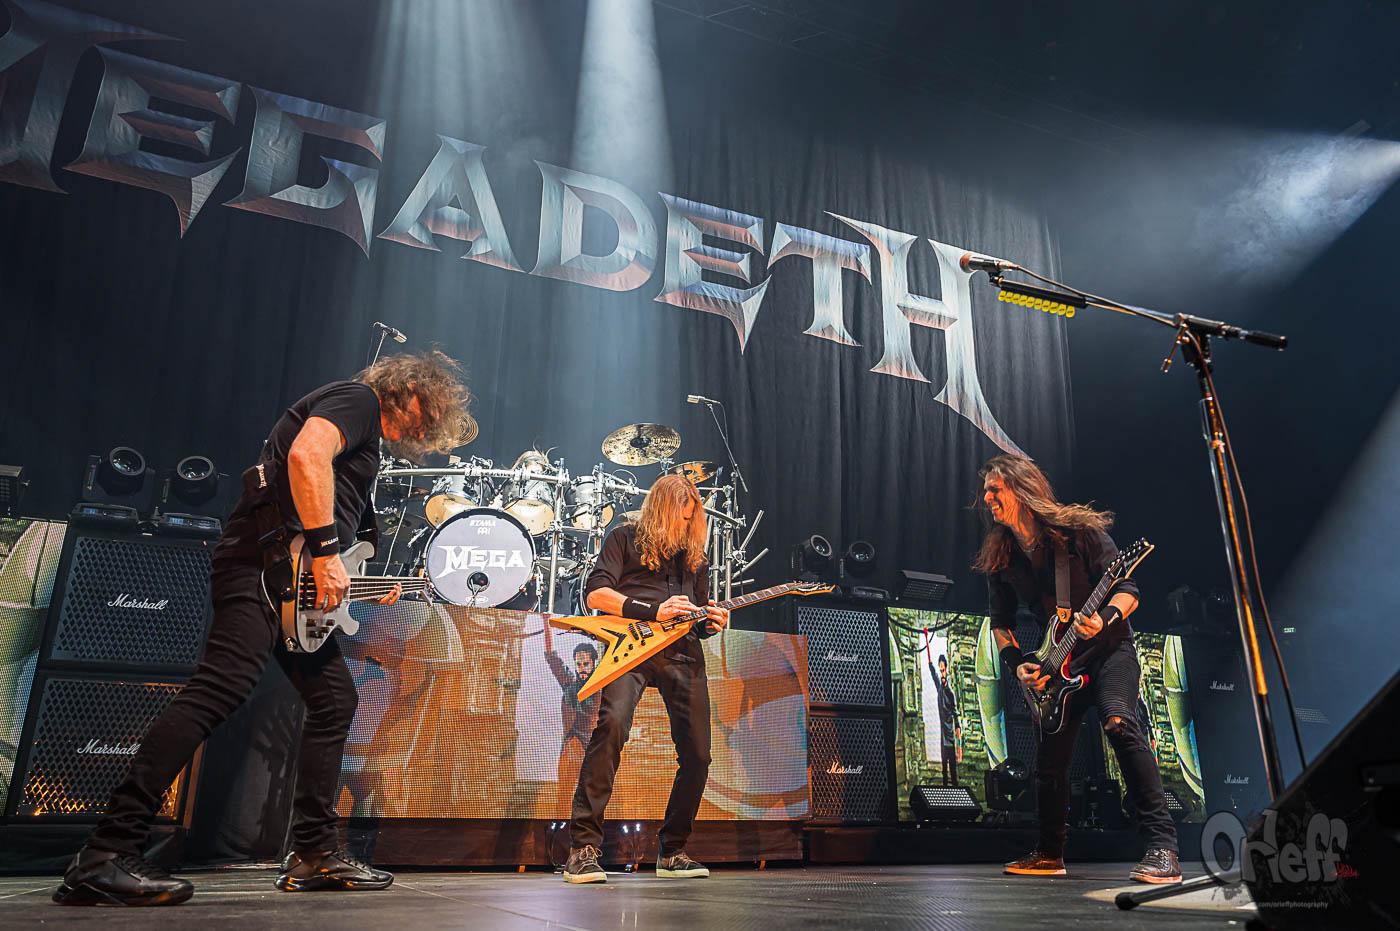 Megadeth @ Arena Armeets, 2020